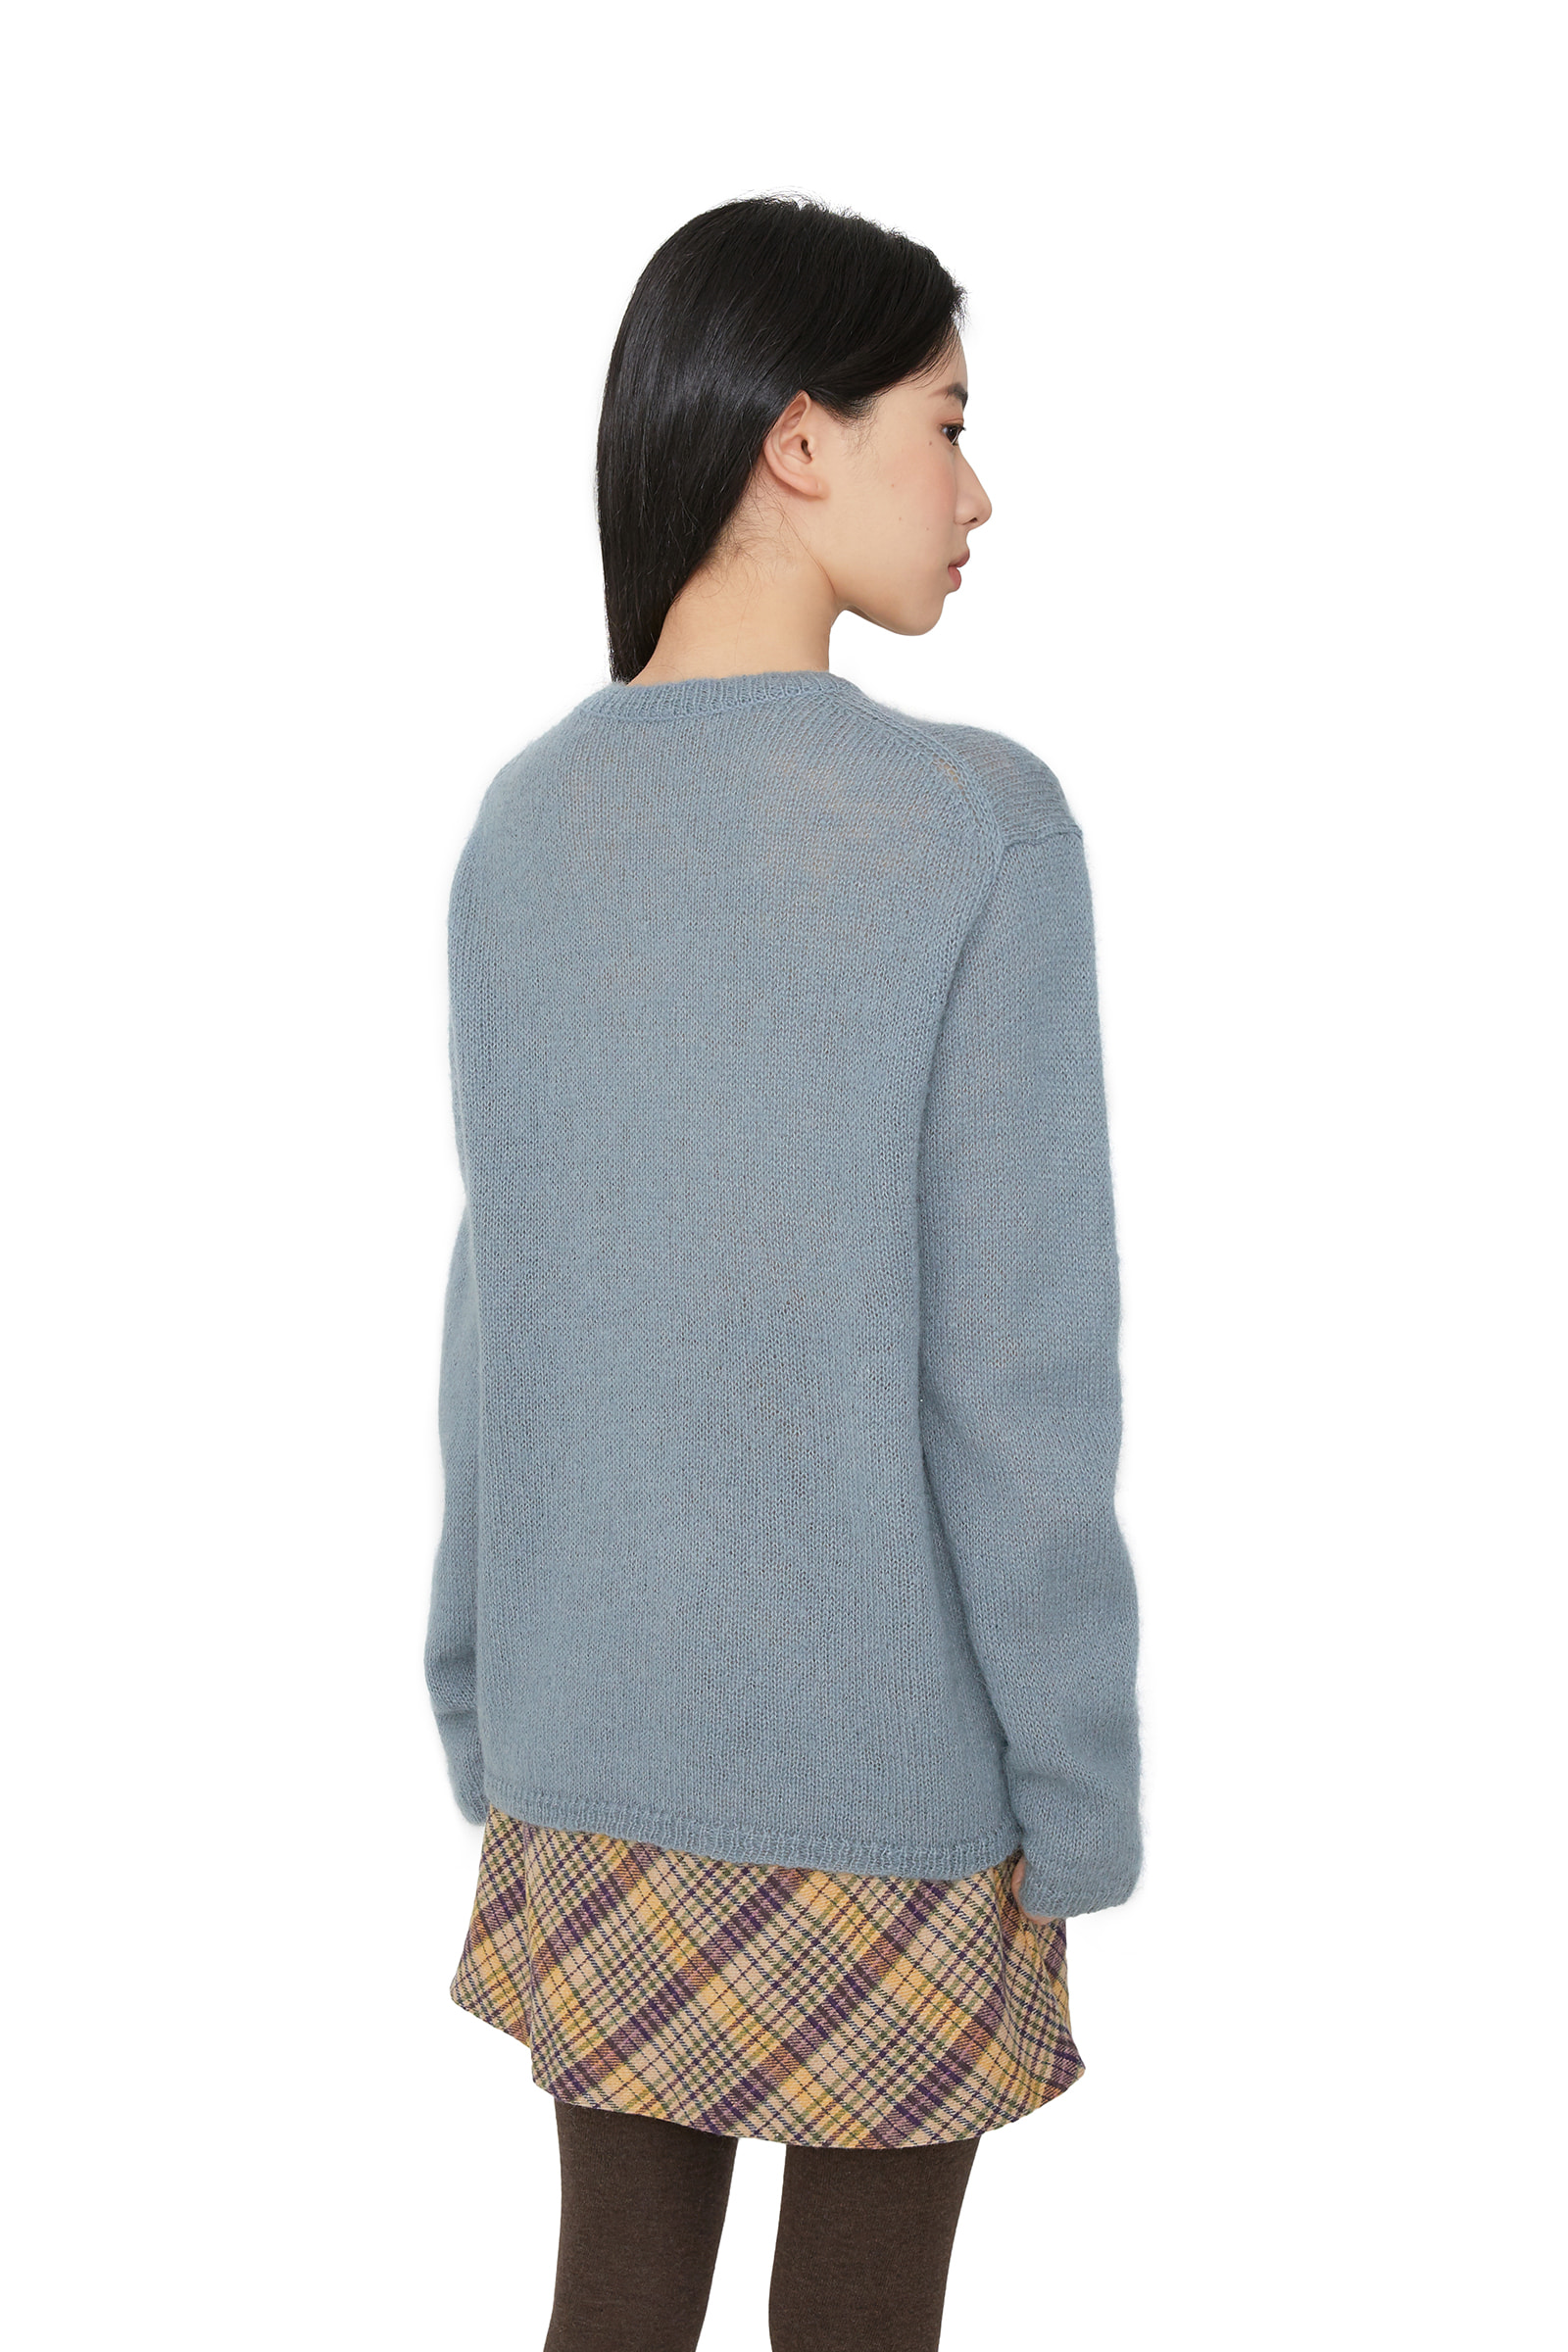 Bubble Merino Wool Crew Neck Knit